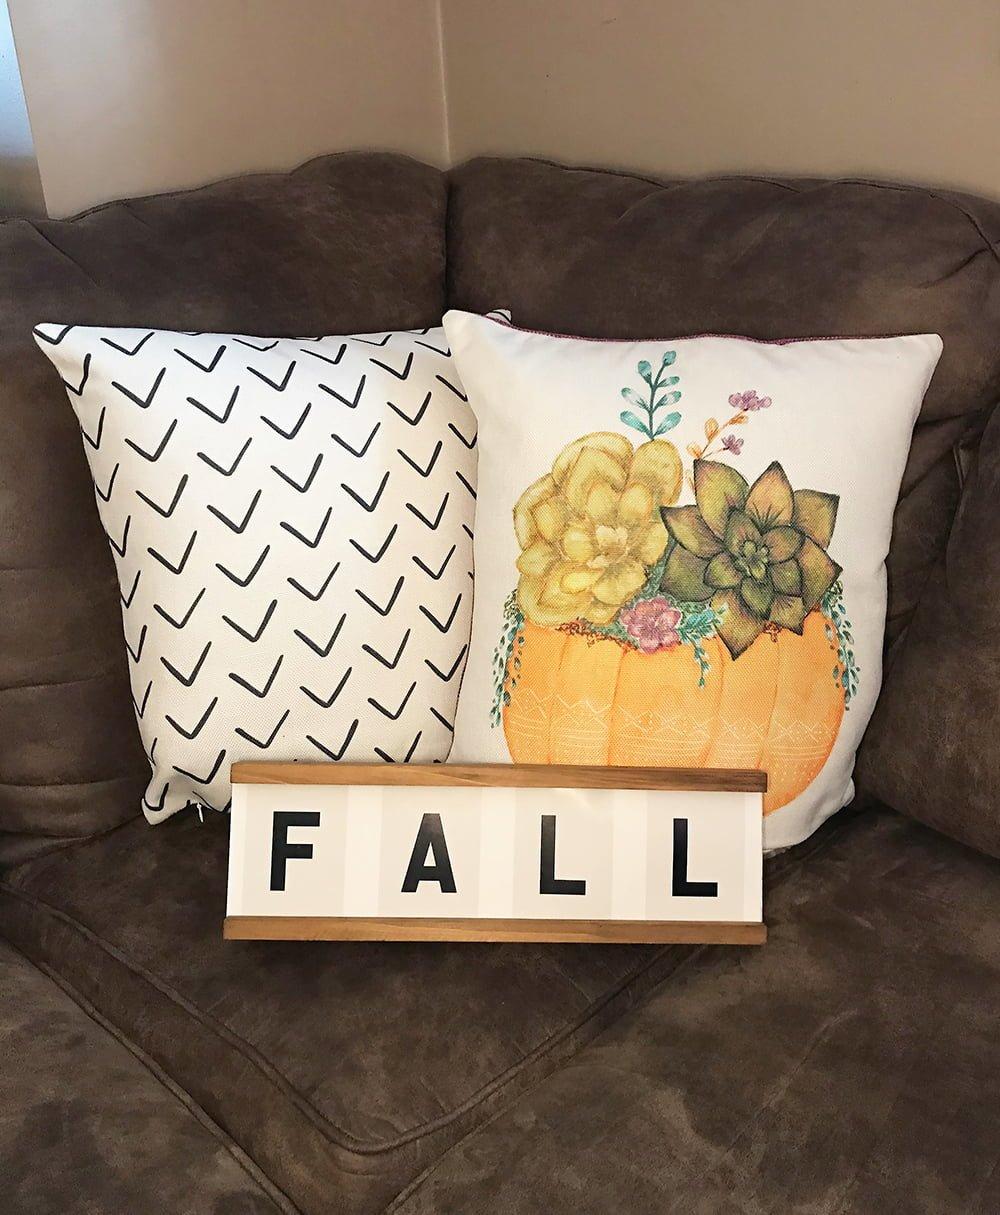 Decocrated fall 2019 home decor subscription box unboxing - Home decor subscription box ...